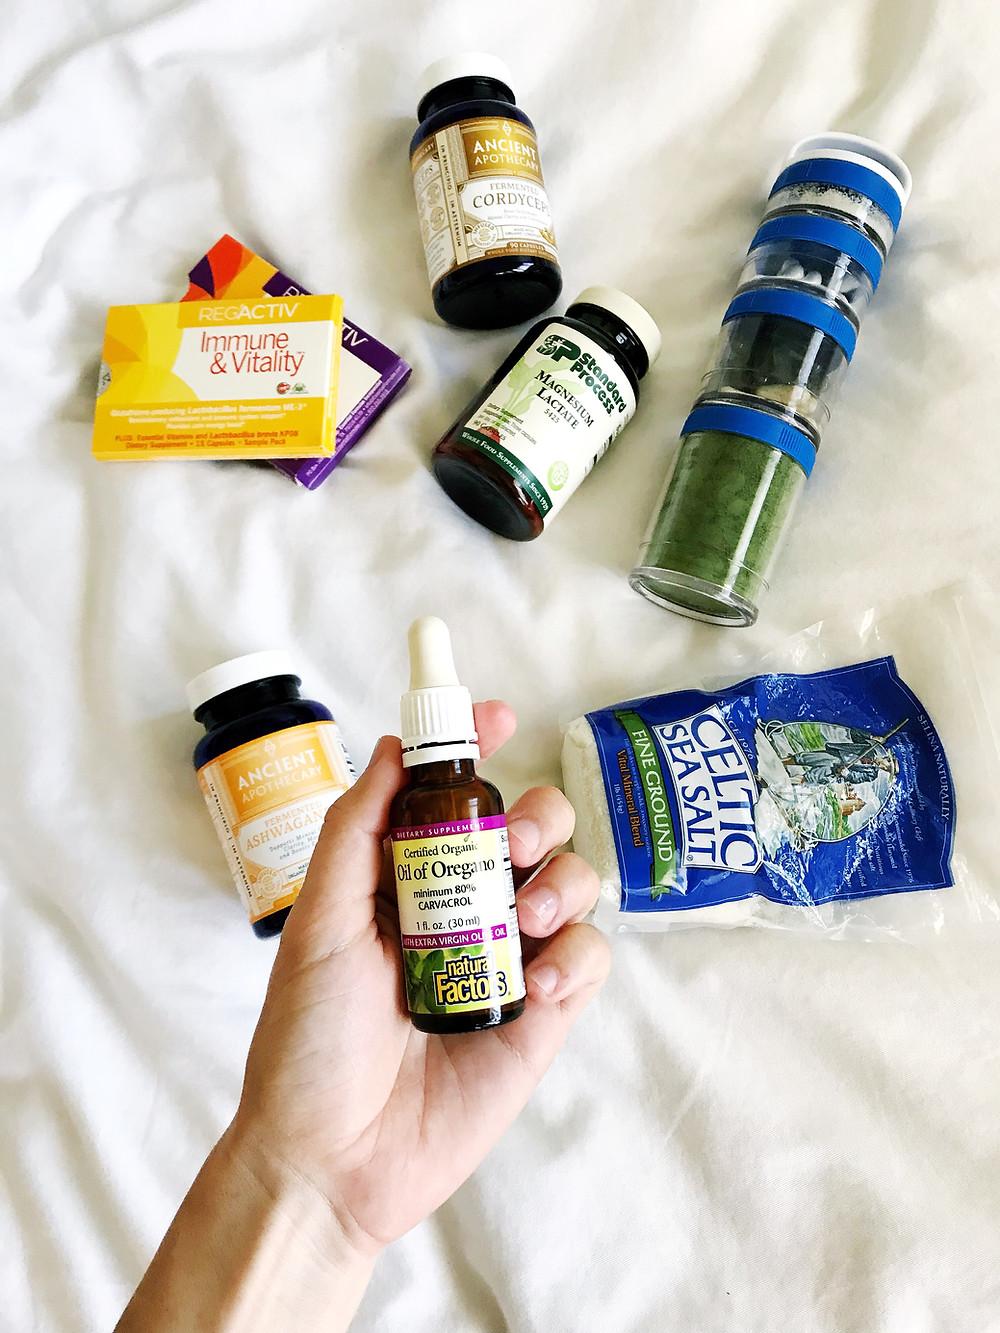 do gummy vitamins make you gain weight?